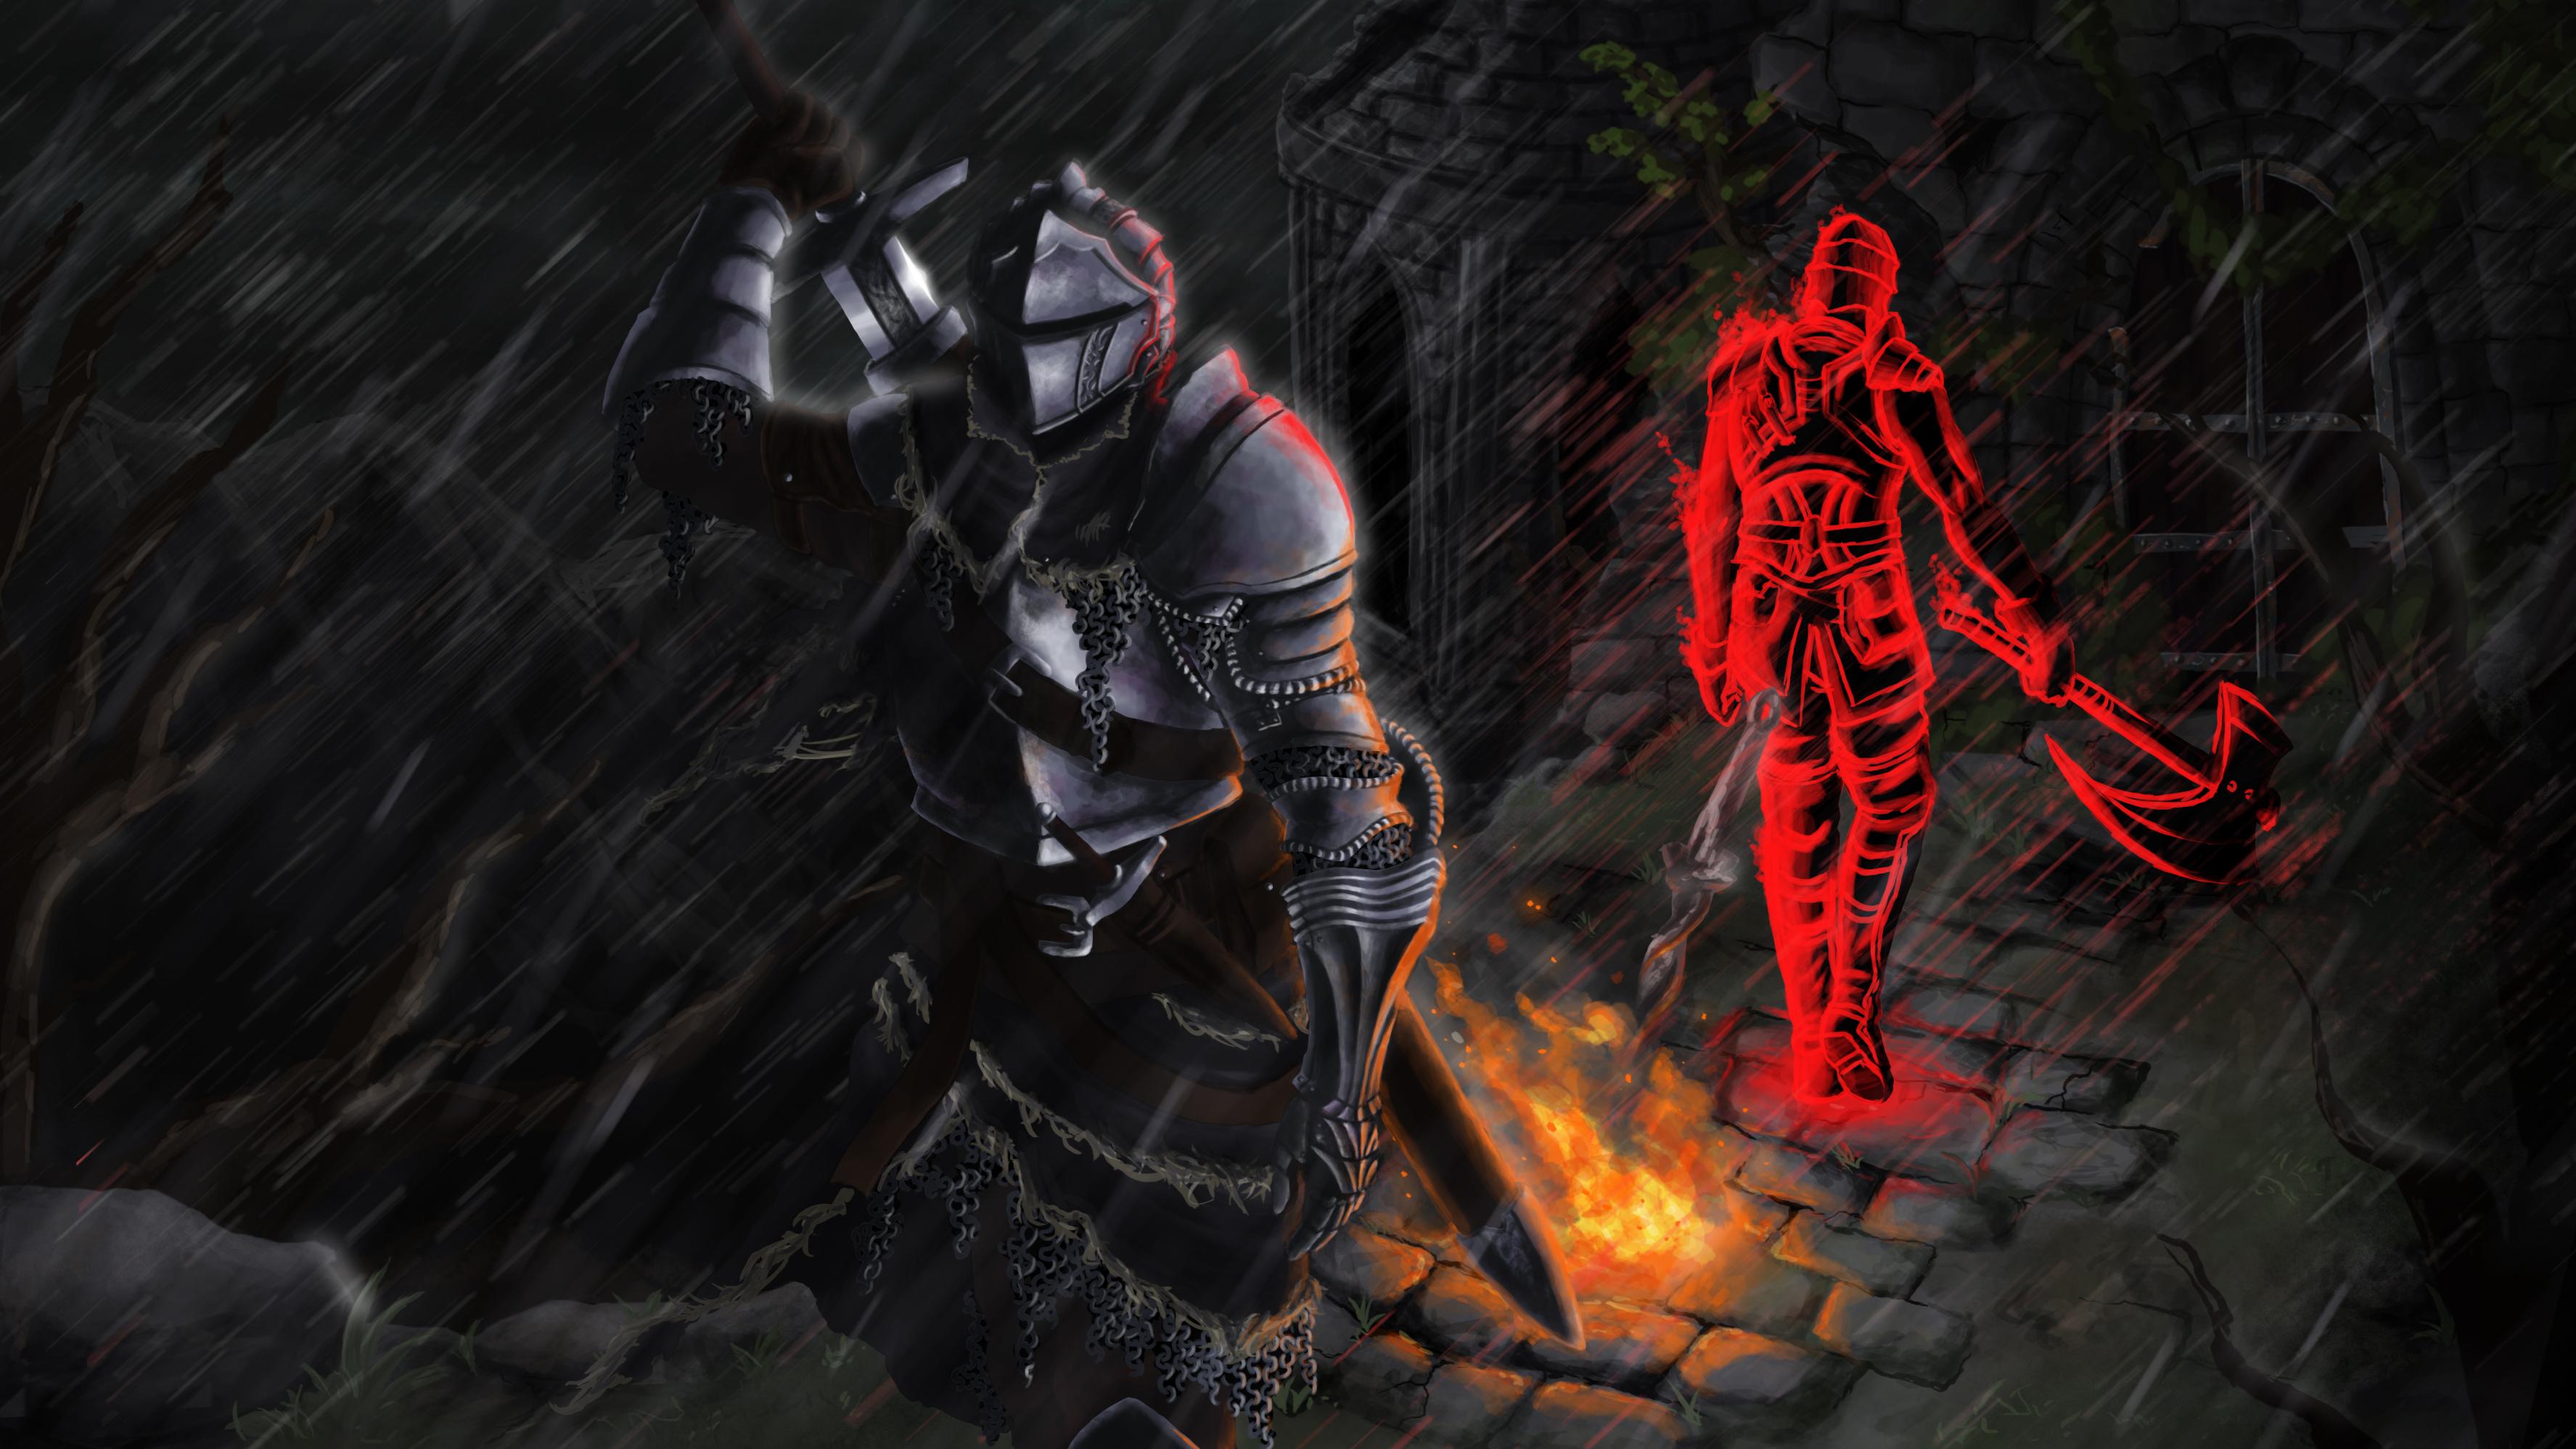 Dark Souls Hd Wallpaper Background Image 3550x1997 Id 982858